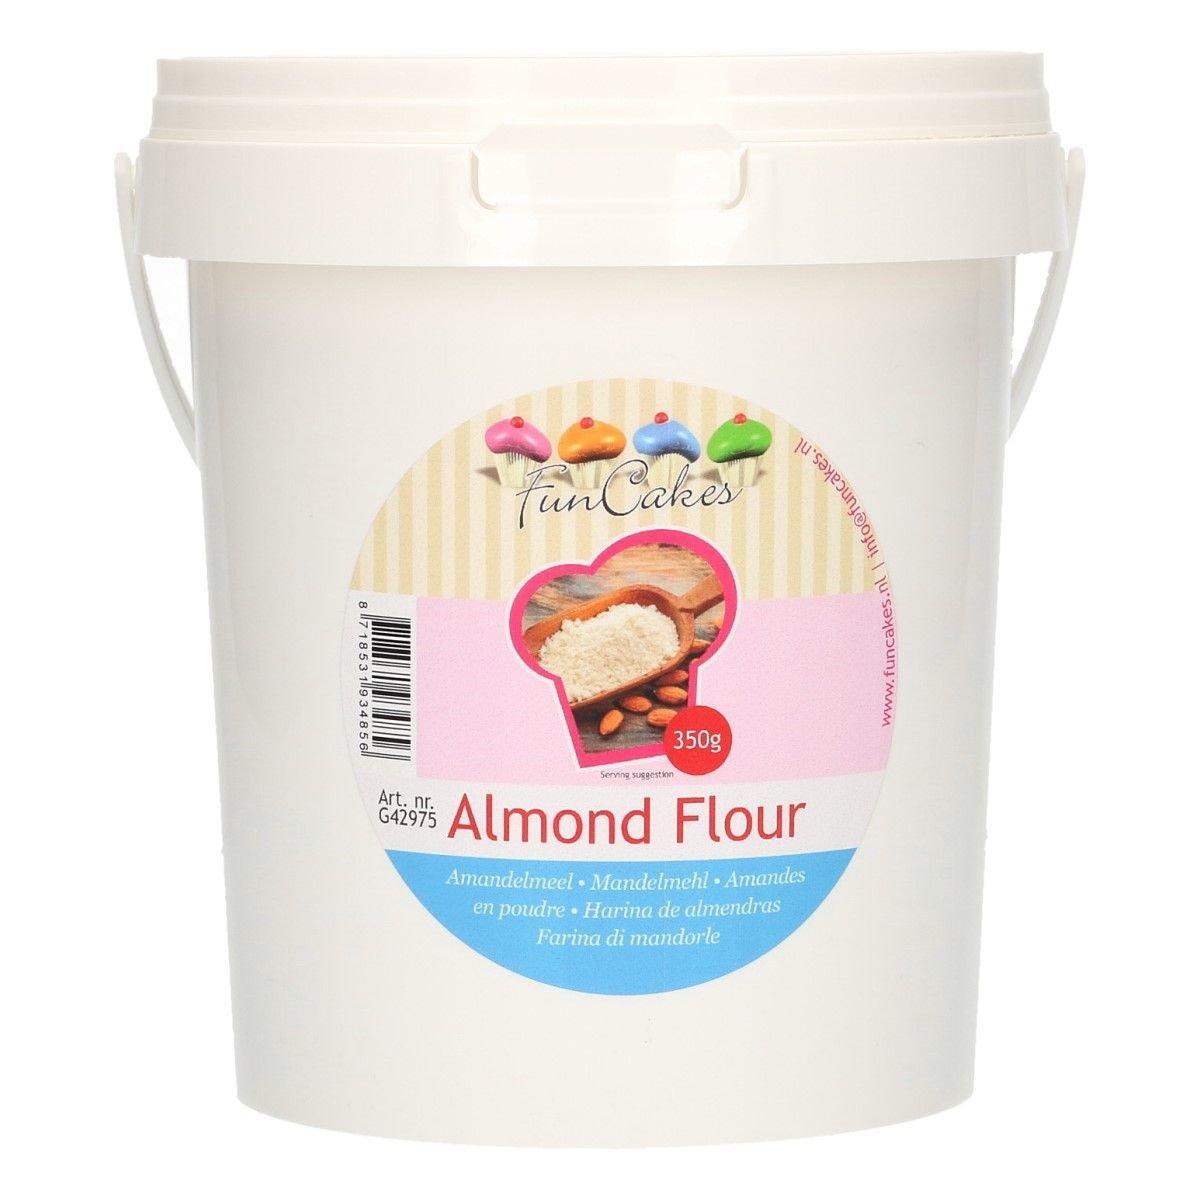 SALE!!! FunCakes Almond Flour -Αλεύρι Αμυγδάλου 350γρ ΑΝΑΛΩΣΗ ΚΑΤΑ ΠΡΟΤΙΜΗΣΗ 31/08/2019